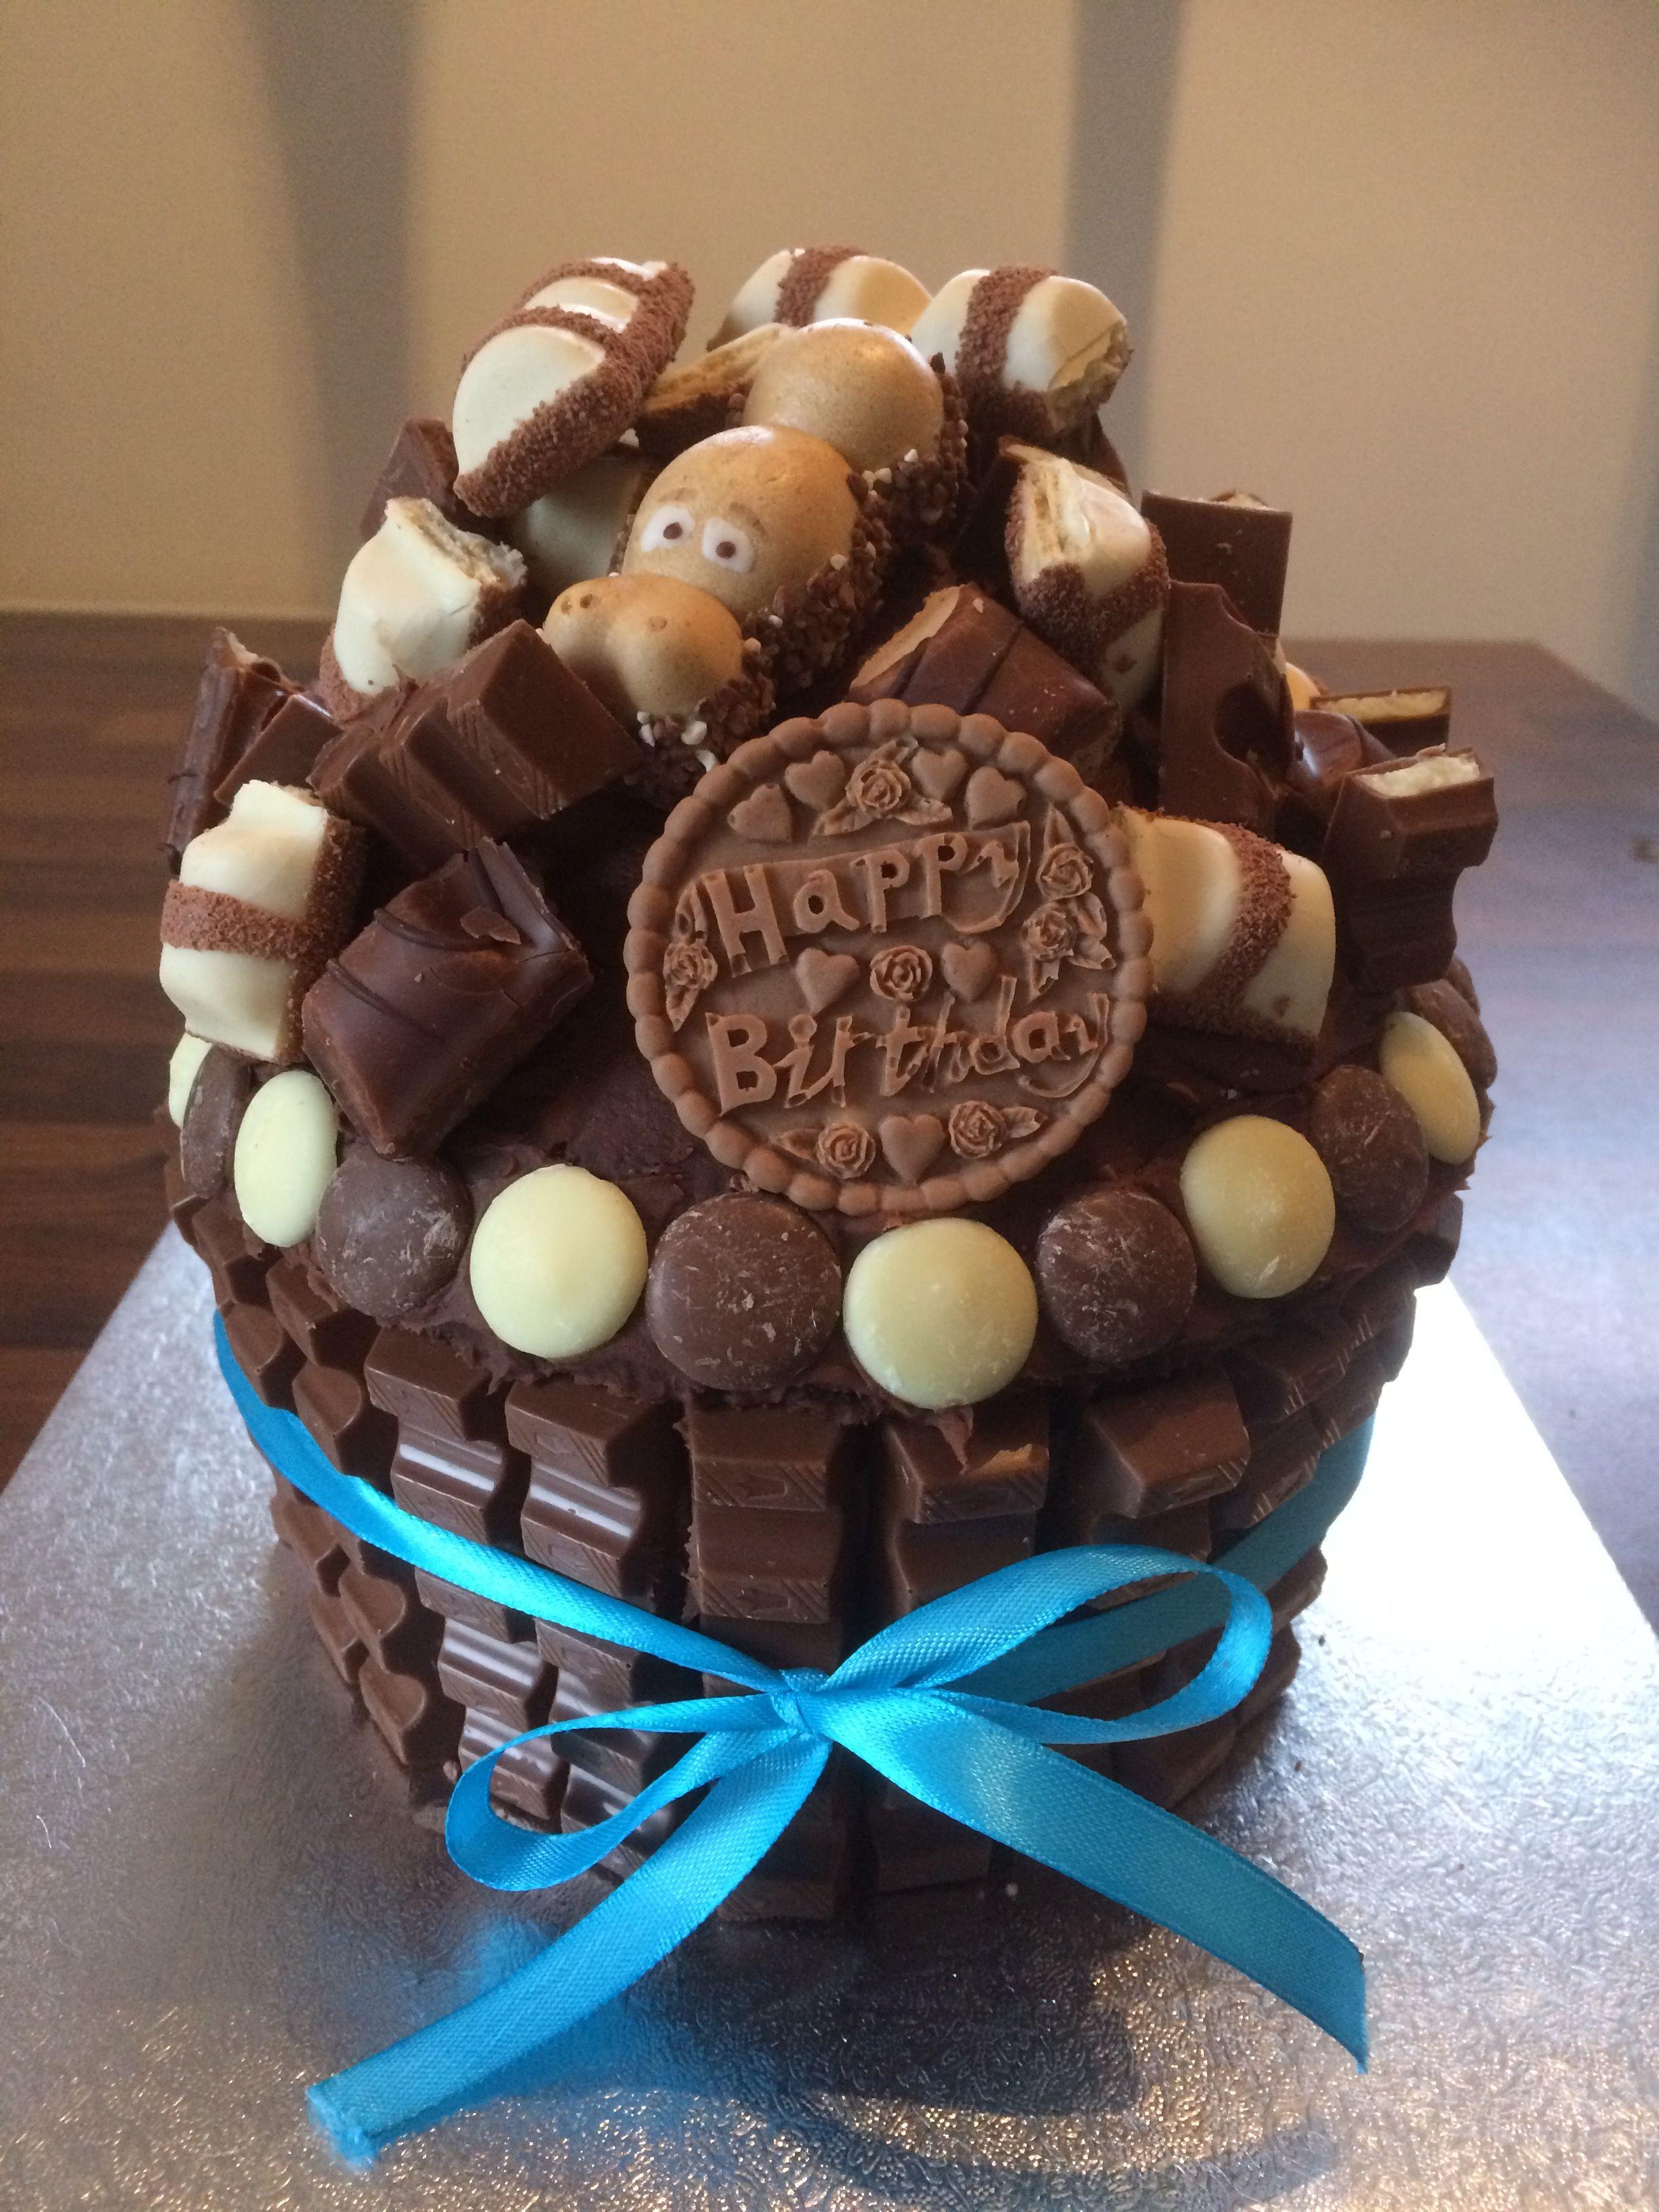 Chocolate cupcake loaded with kinder chocolate bars